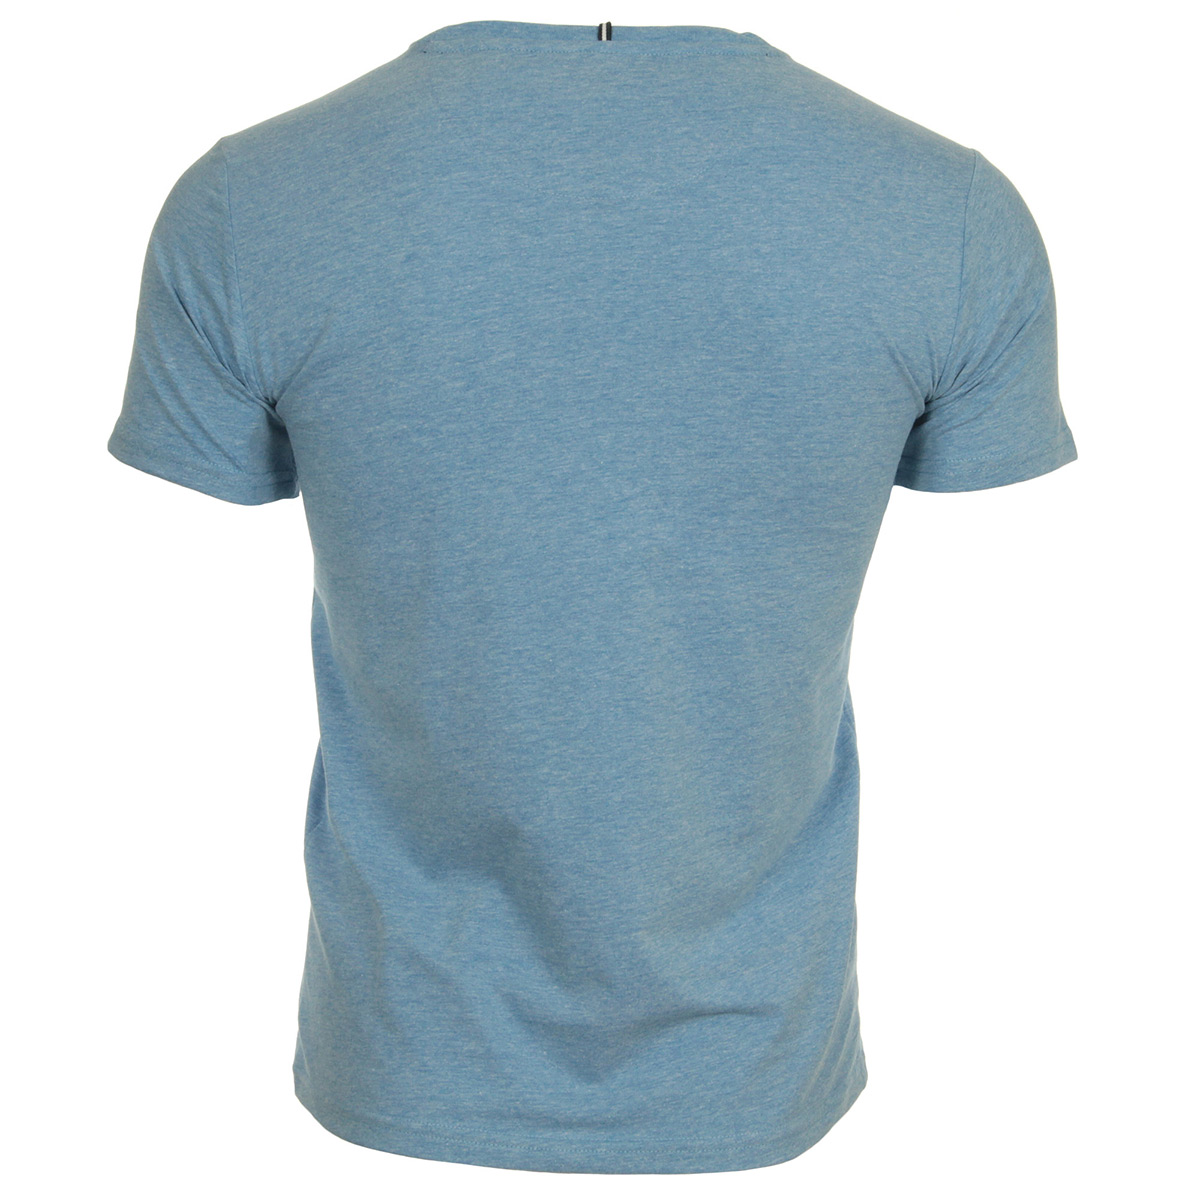 Ellesse T-Shirt EH TMC Uni Bleu Chine 1031NUNIBLEUCHINE, T-Shirts homme